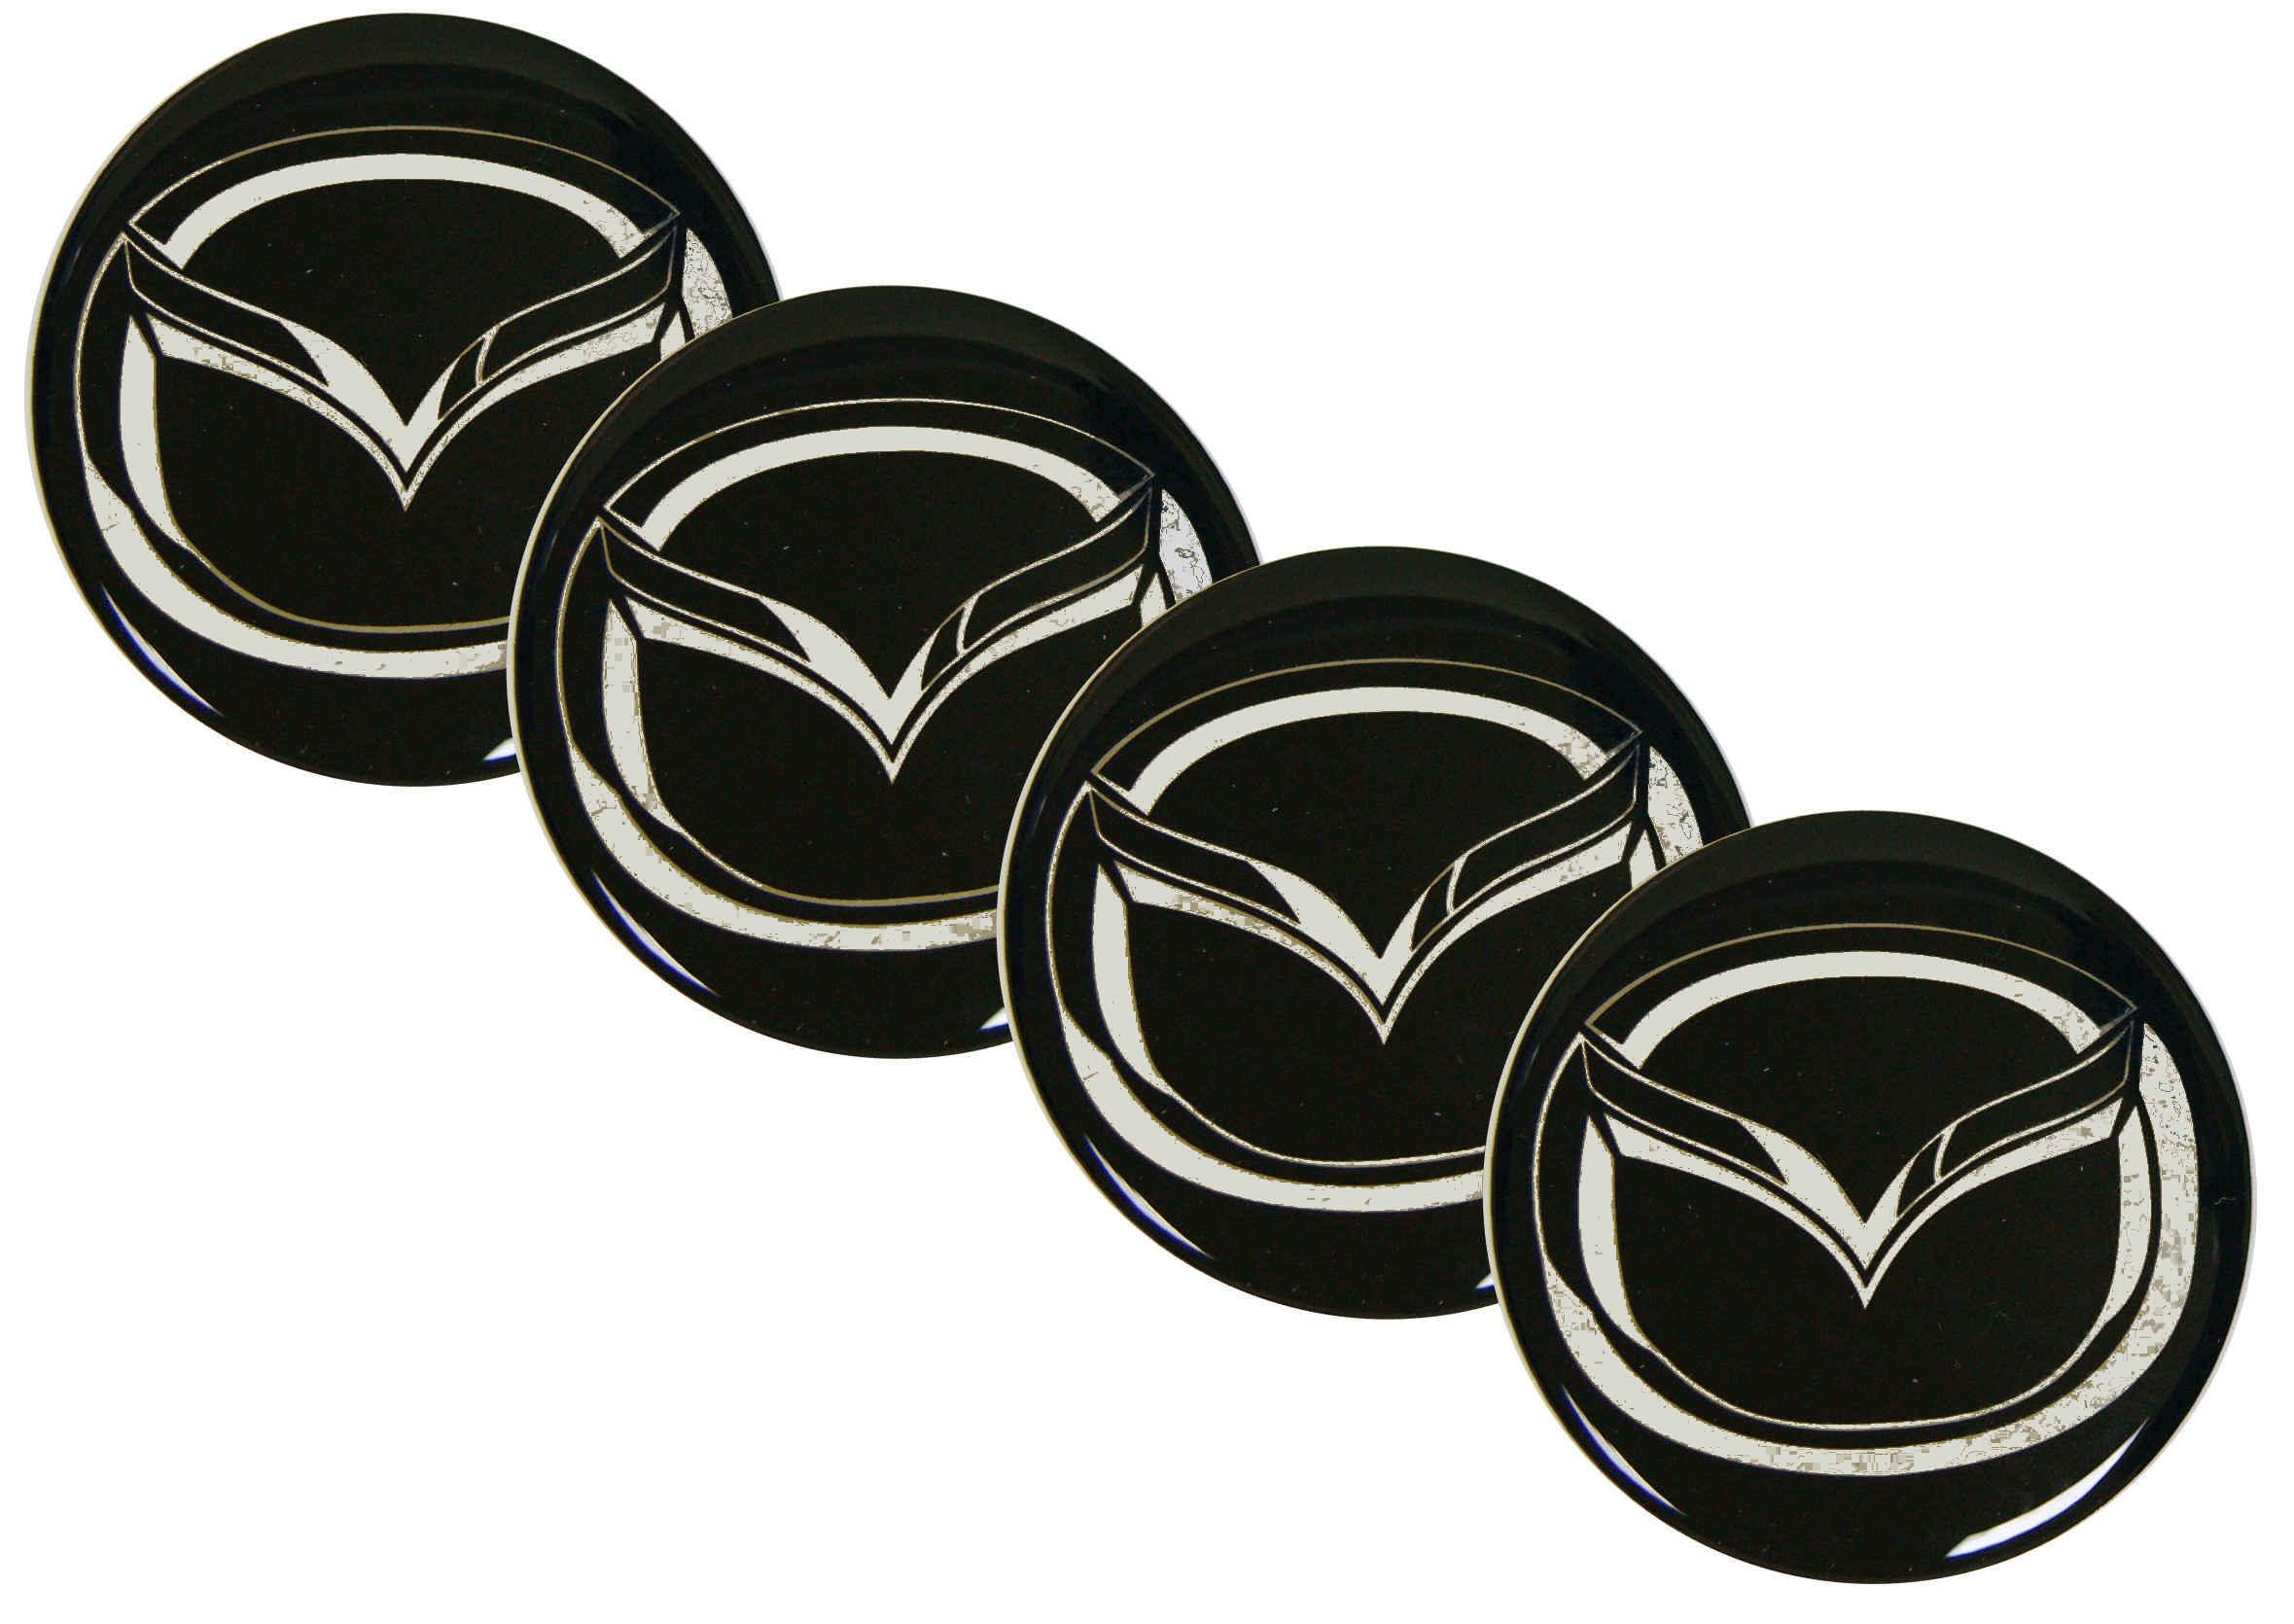 Emblematy Naklejki Wypukłe Mazda 70 mm 4szt